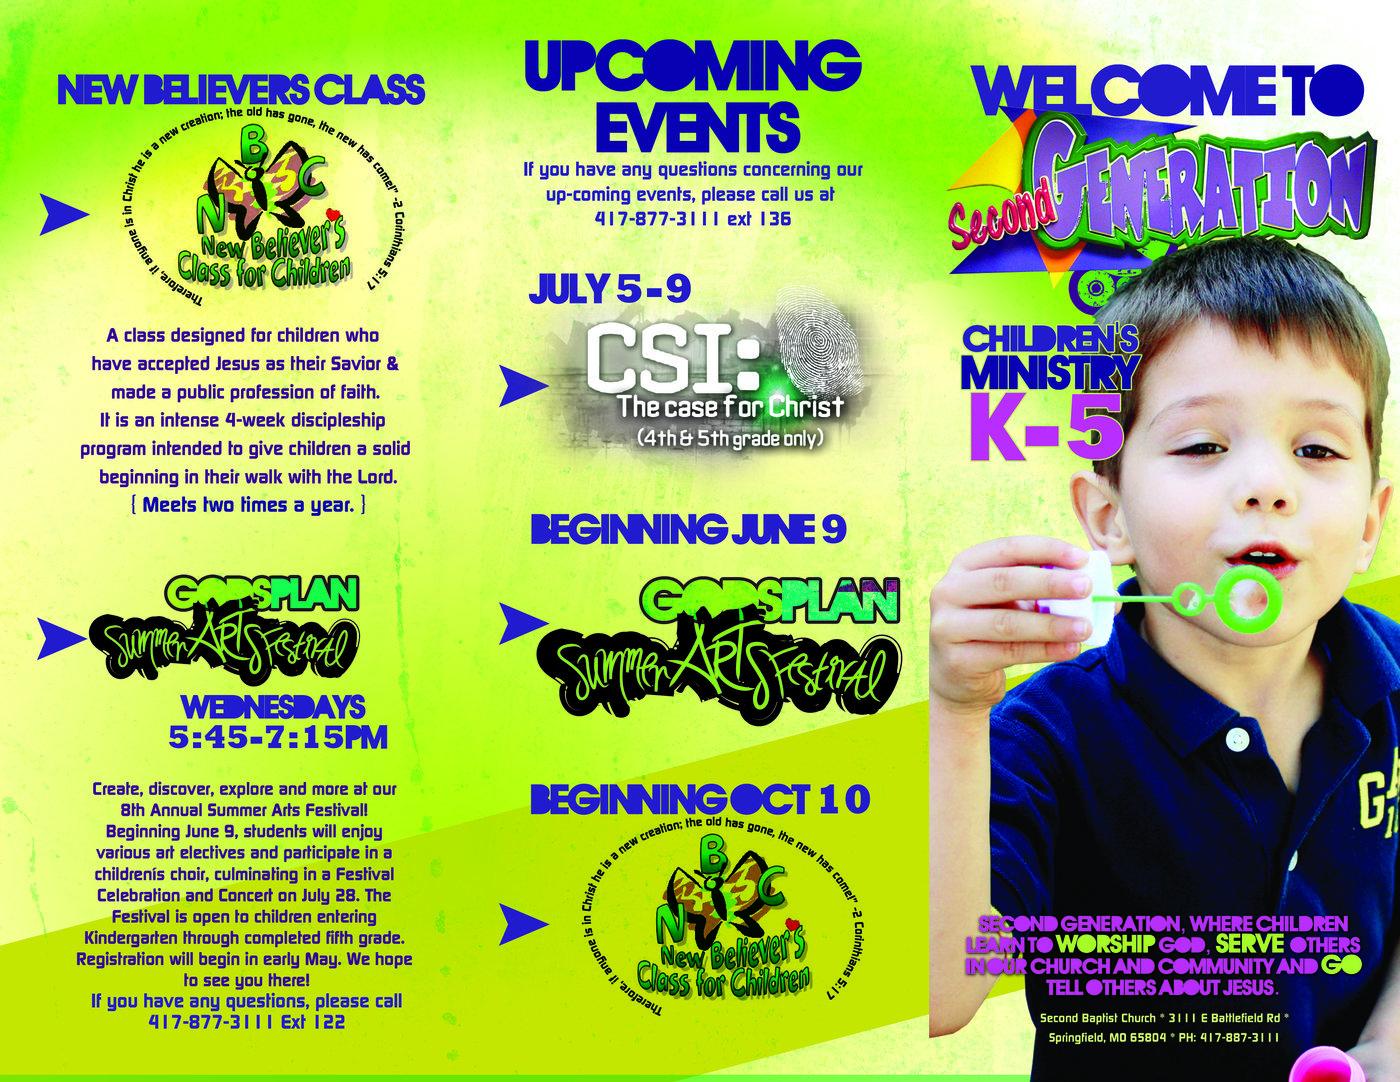 church kids area information brochure by leah kiser at coroflot com